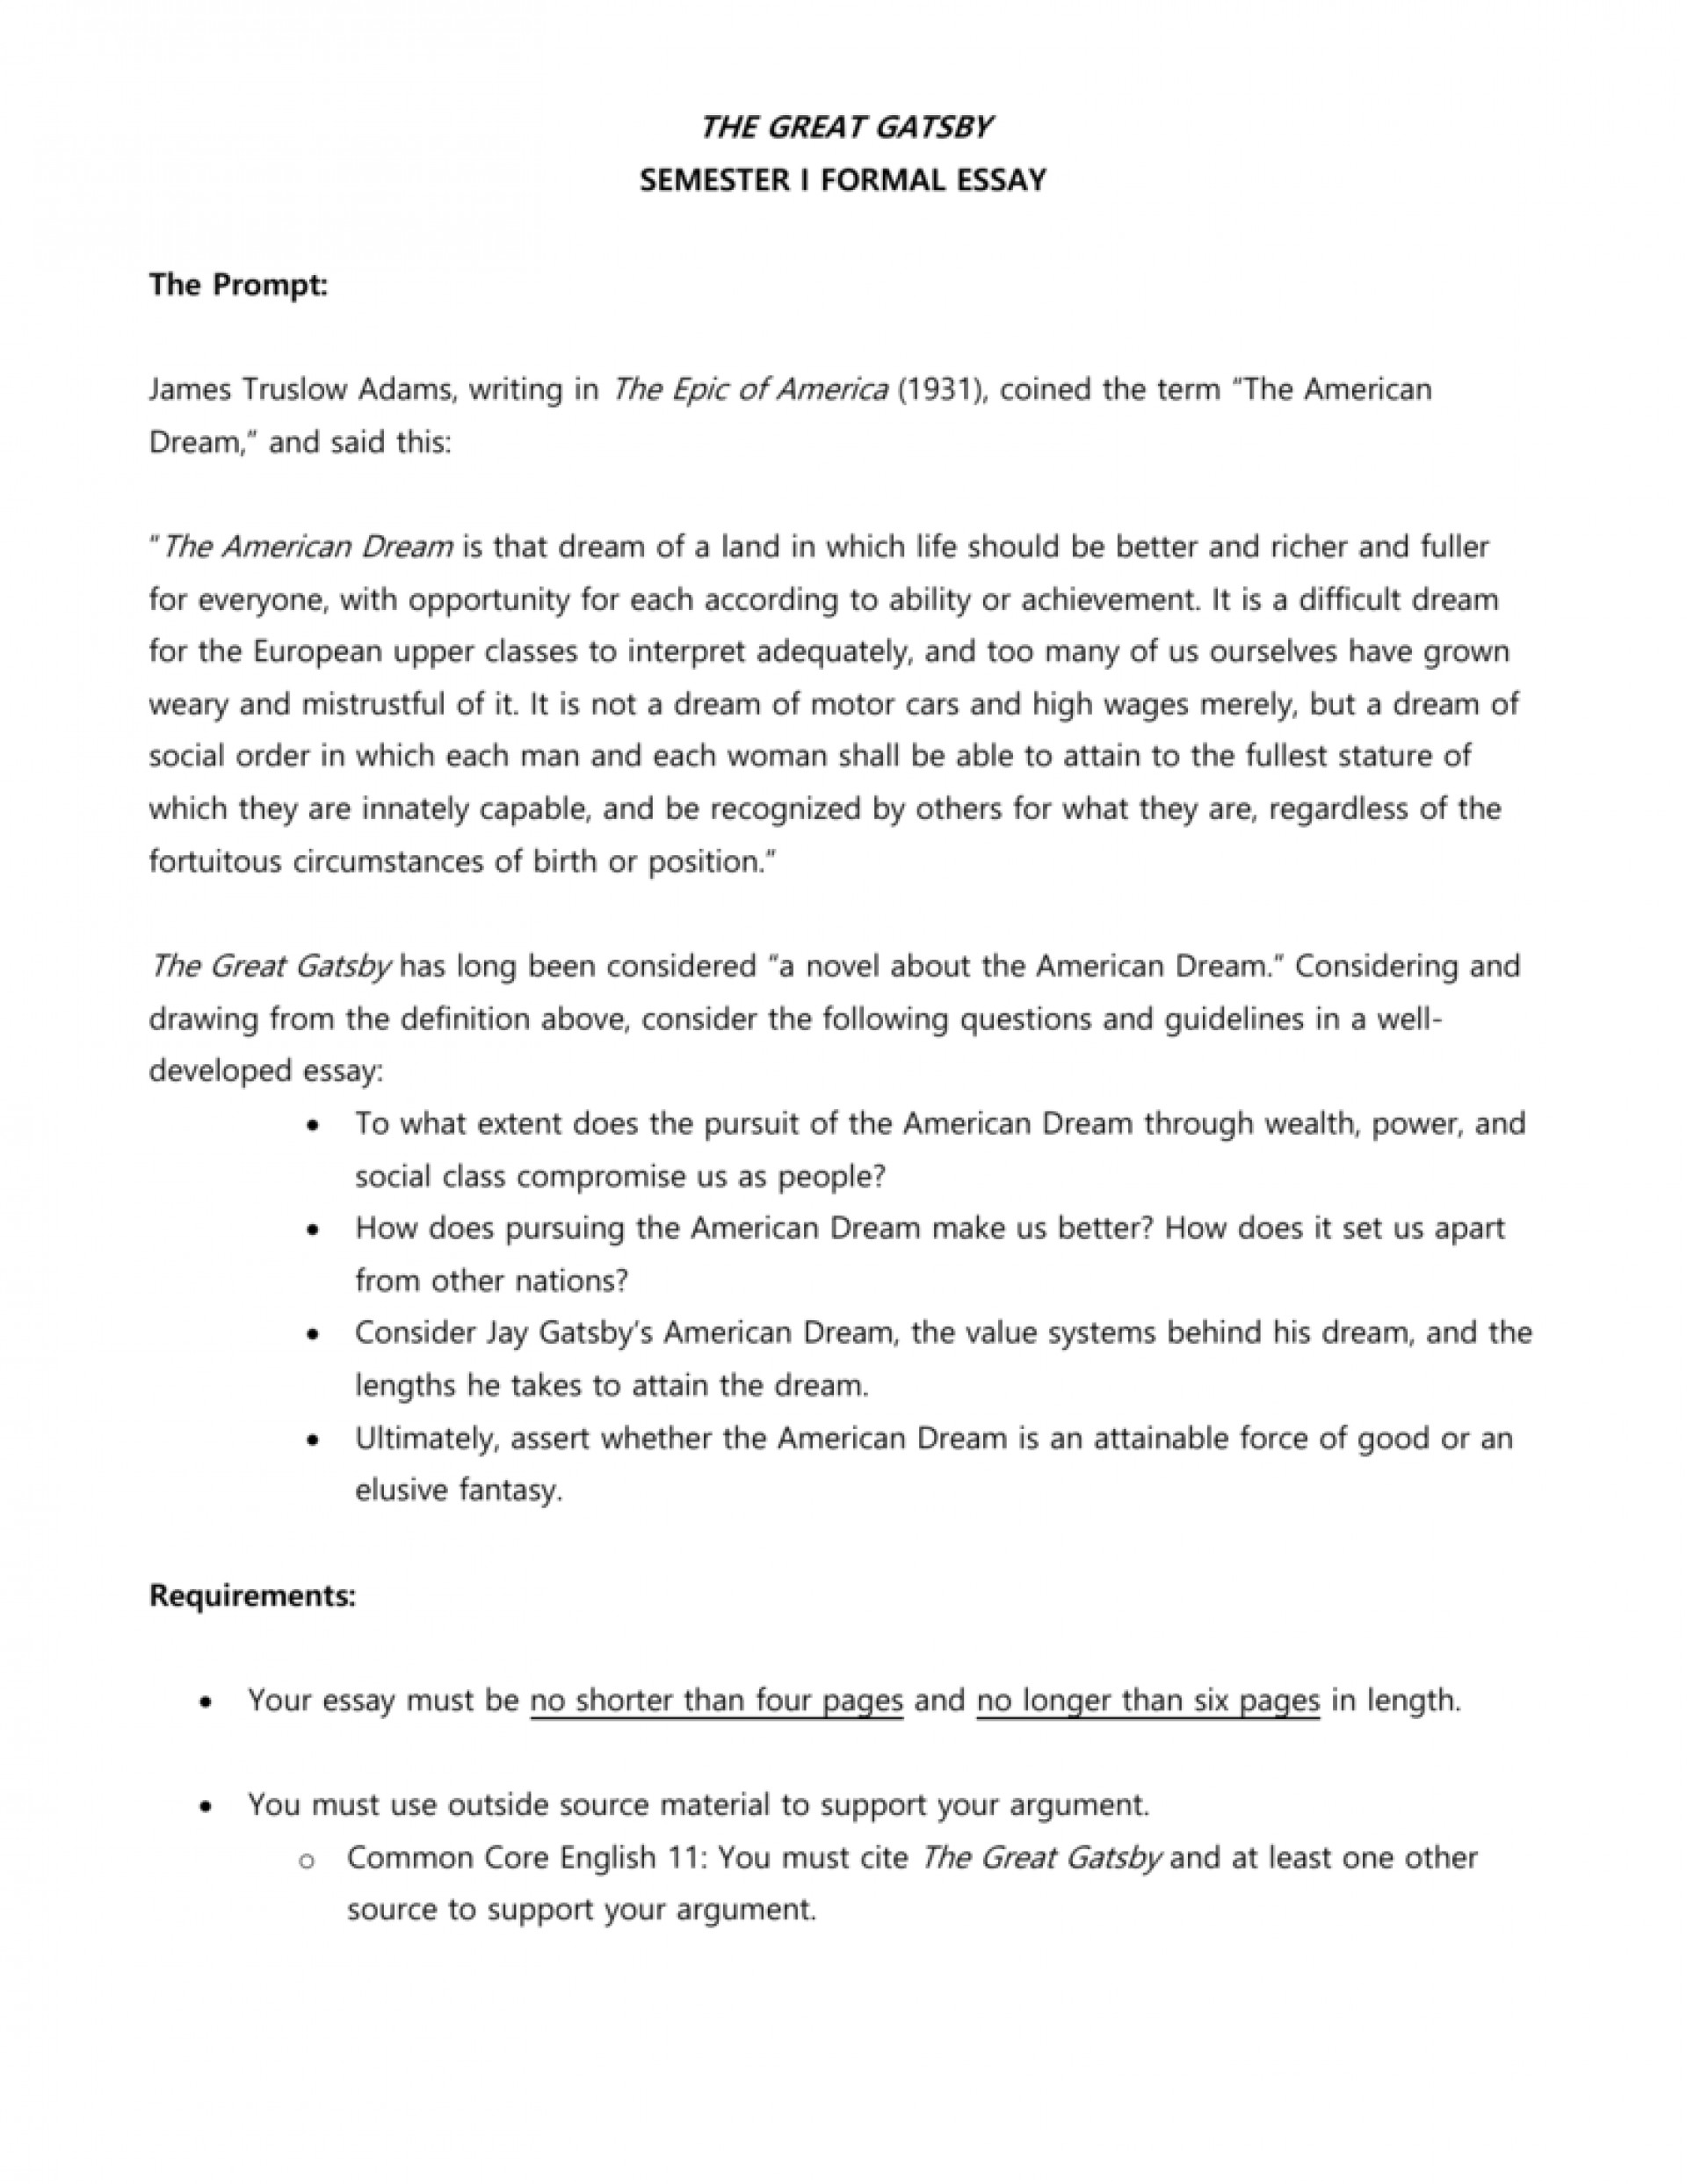 010 Great Gatsby American Dream Essay 007181178 1 Fantastic Conclusion The Pdf Free 1920